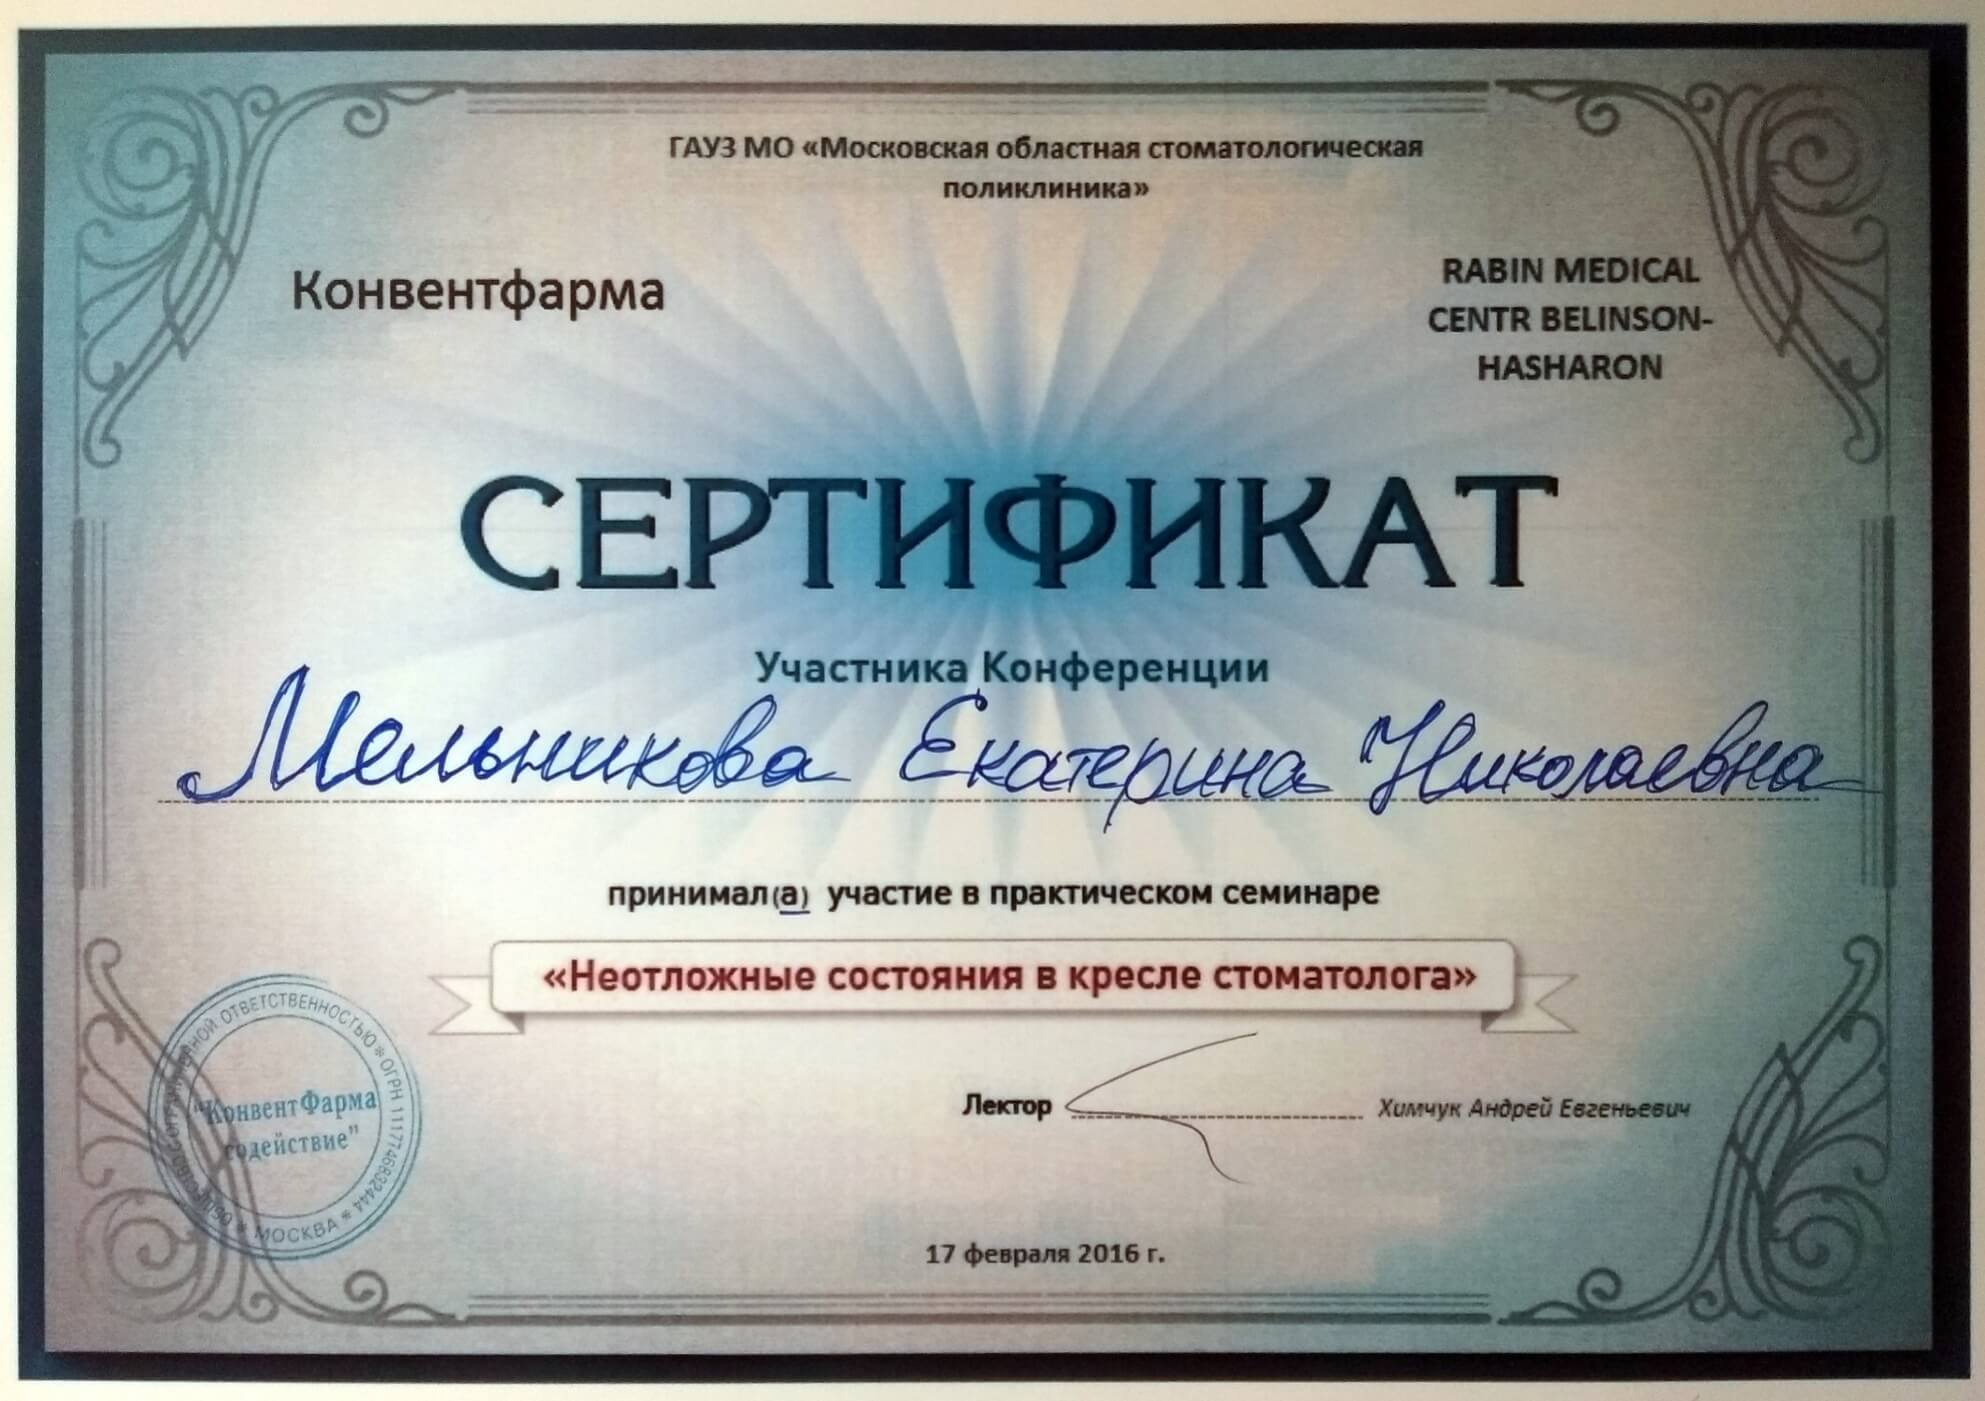 Куликова В. С. — сертификат №11